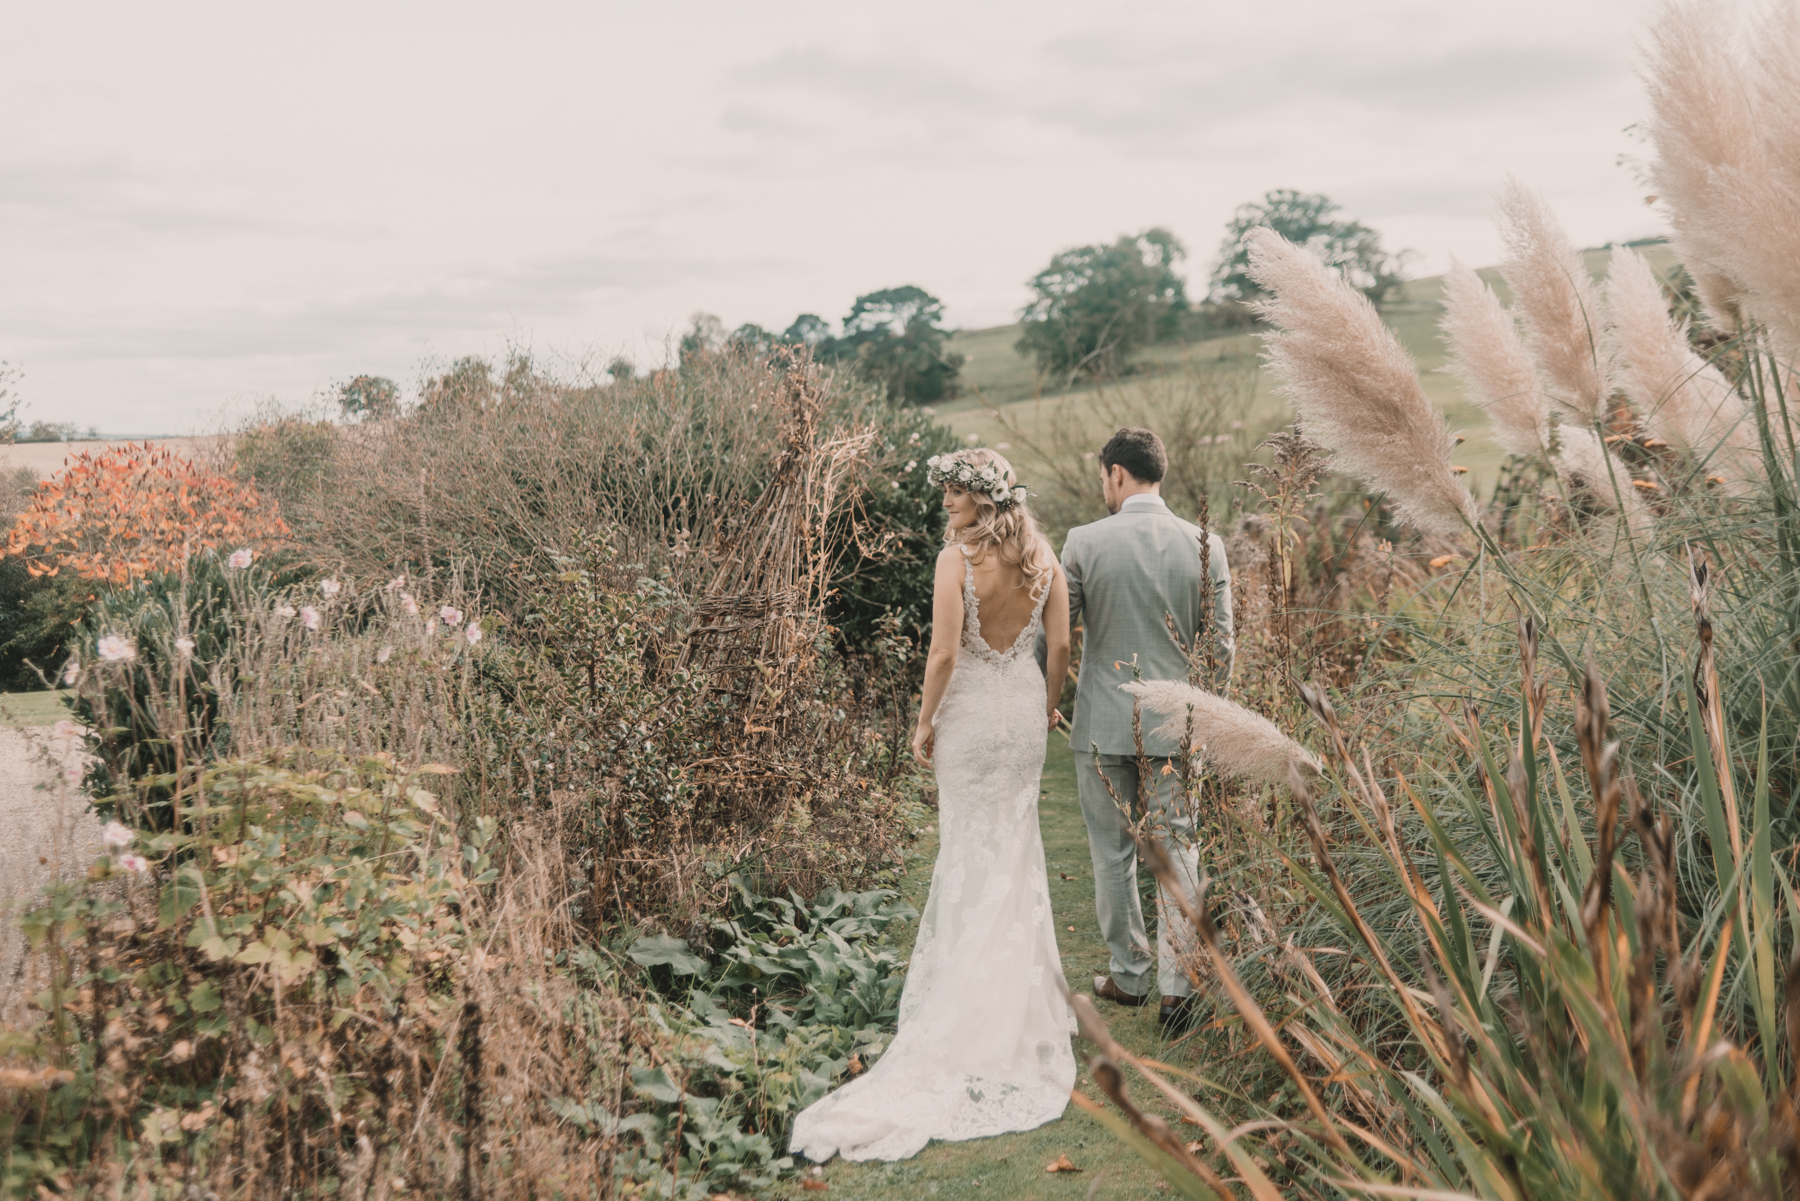 Herefordshire-barn-wedding-highlights-091.jpg